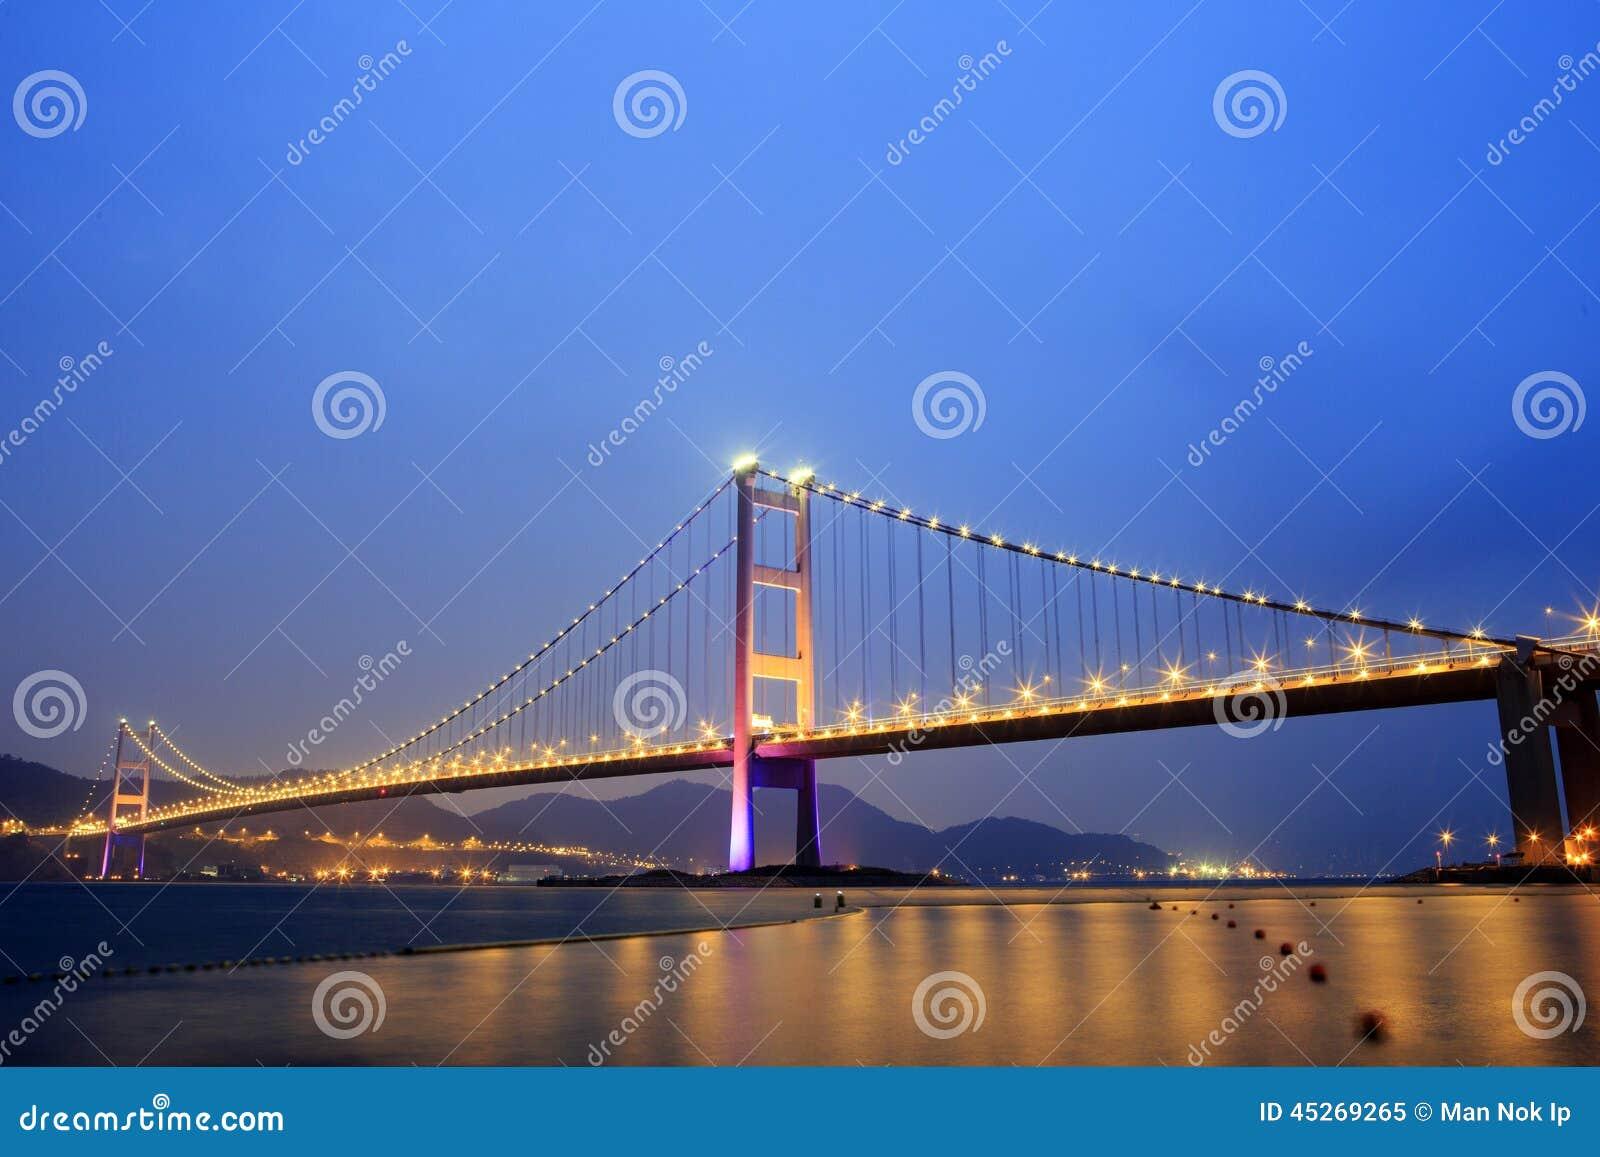 Pont suspendu en hong kong image ditorial image 45269265 - Pont des arts hong kong ...